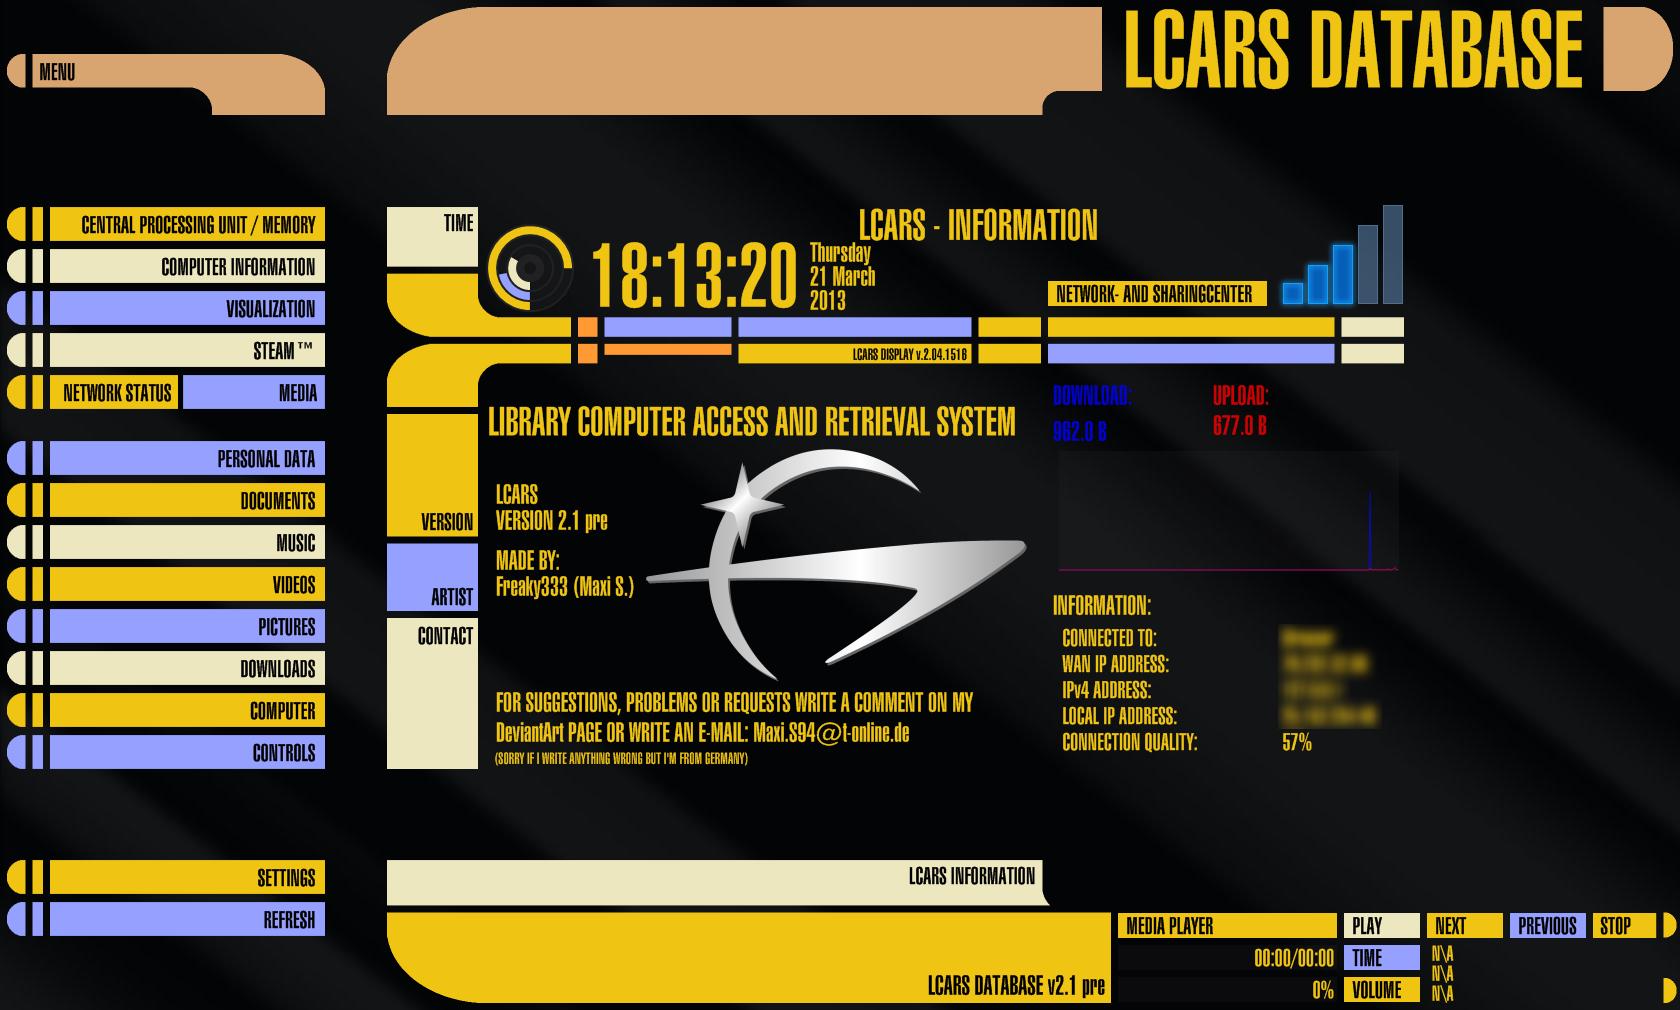 Star Trek Control Panel Wallpaper on Star Trek Deep Space Nine Blueprints